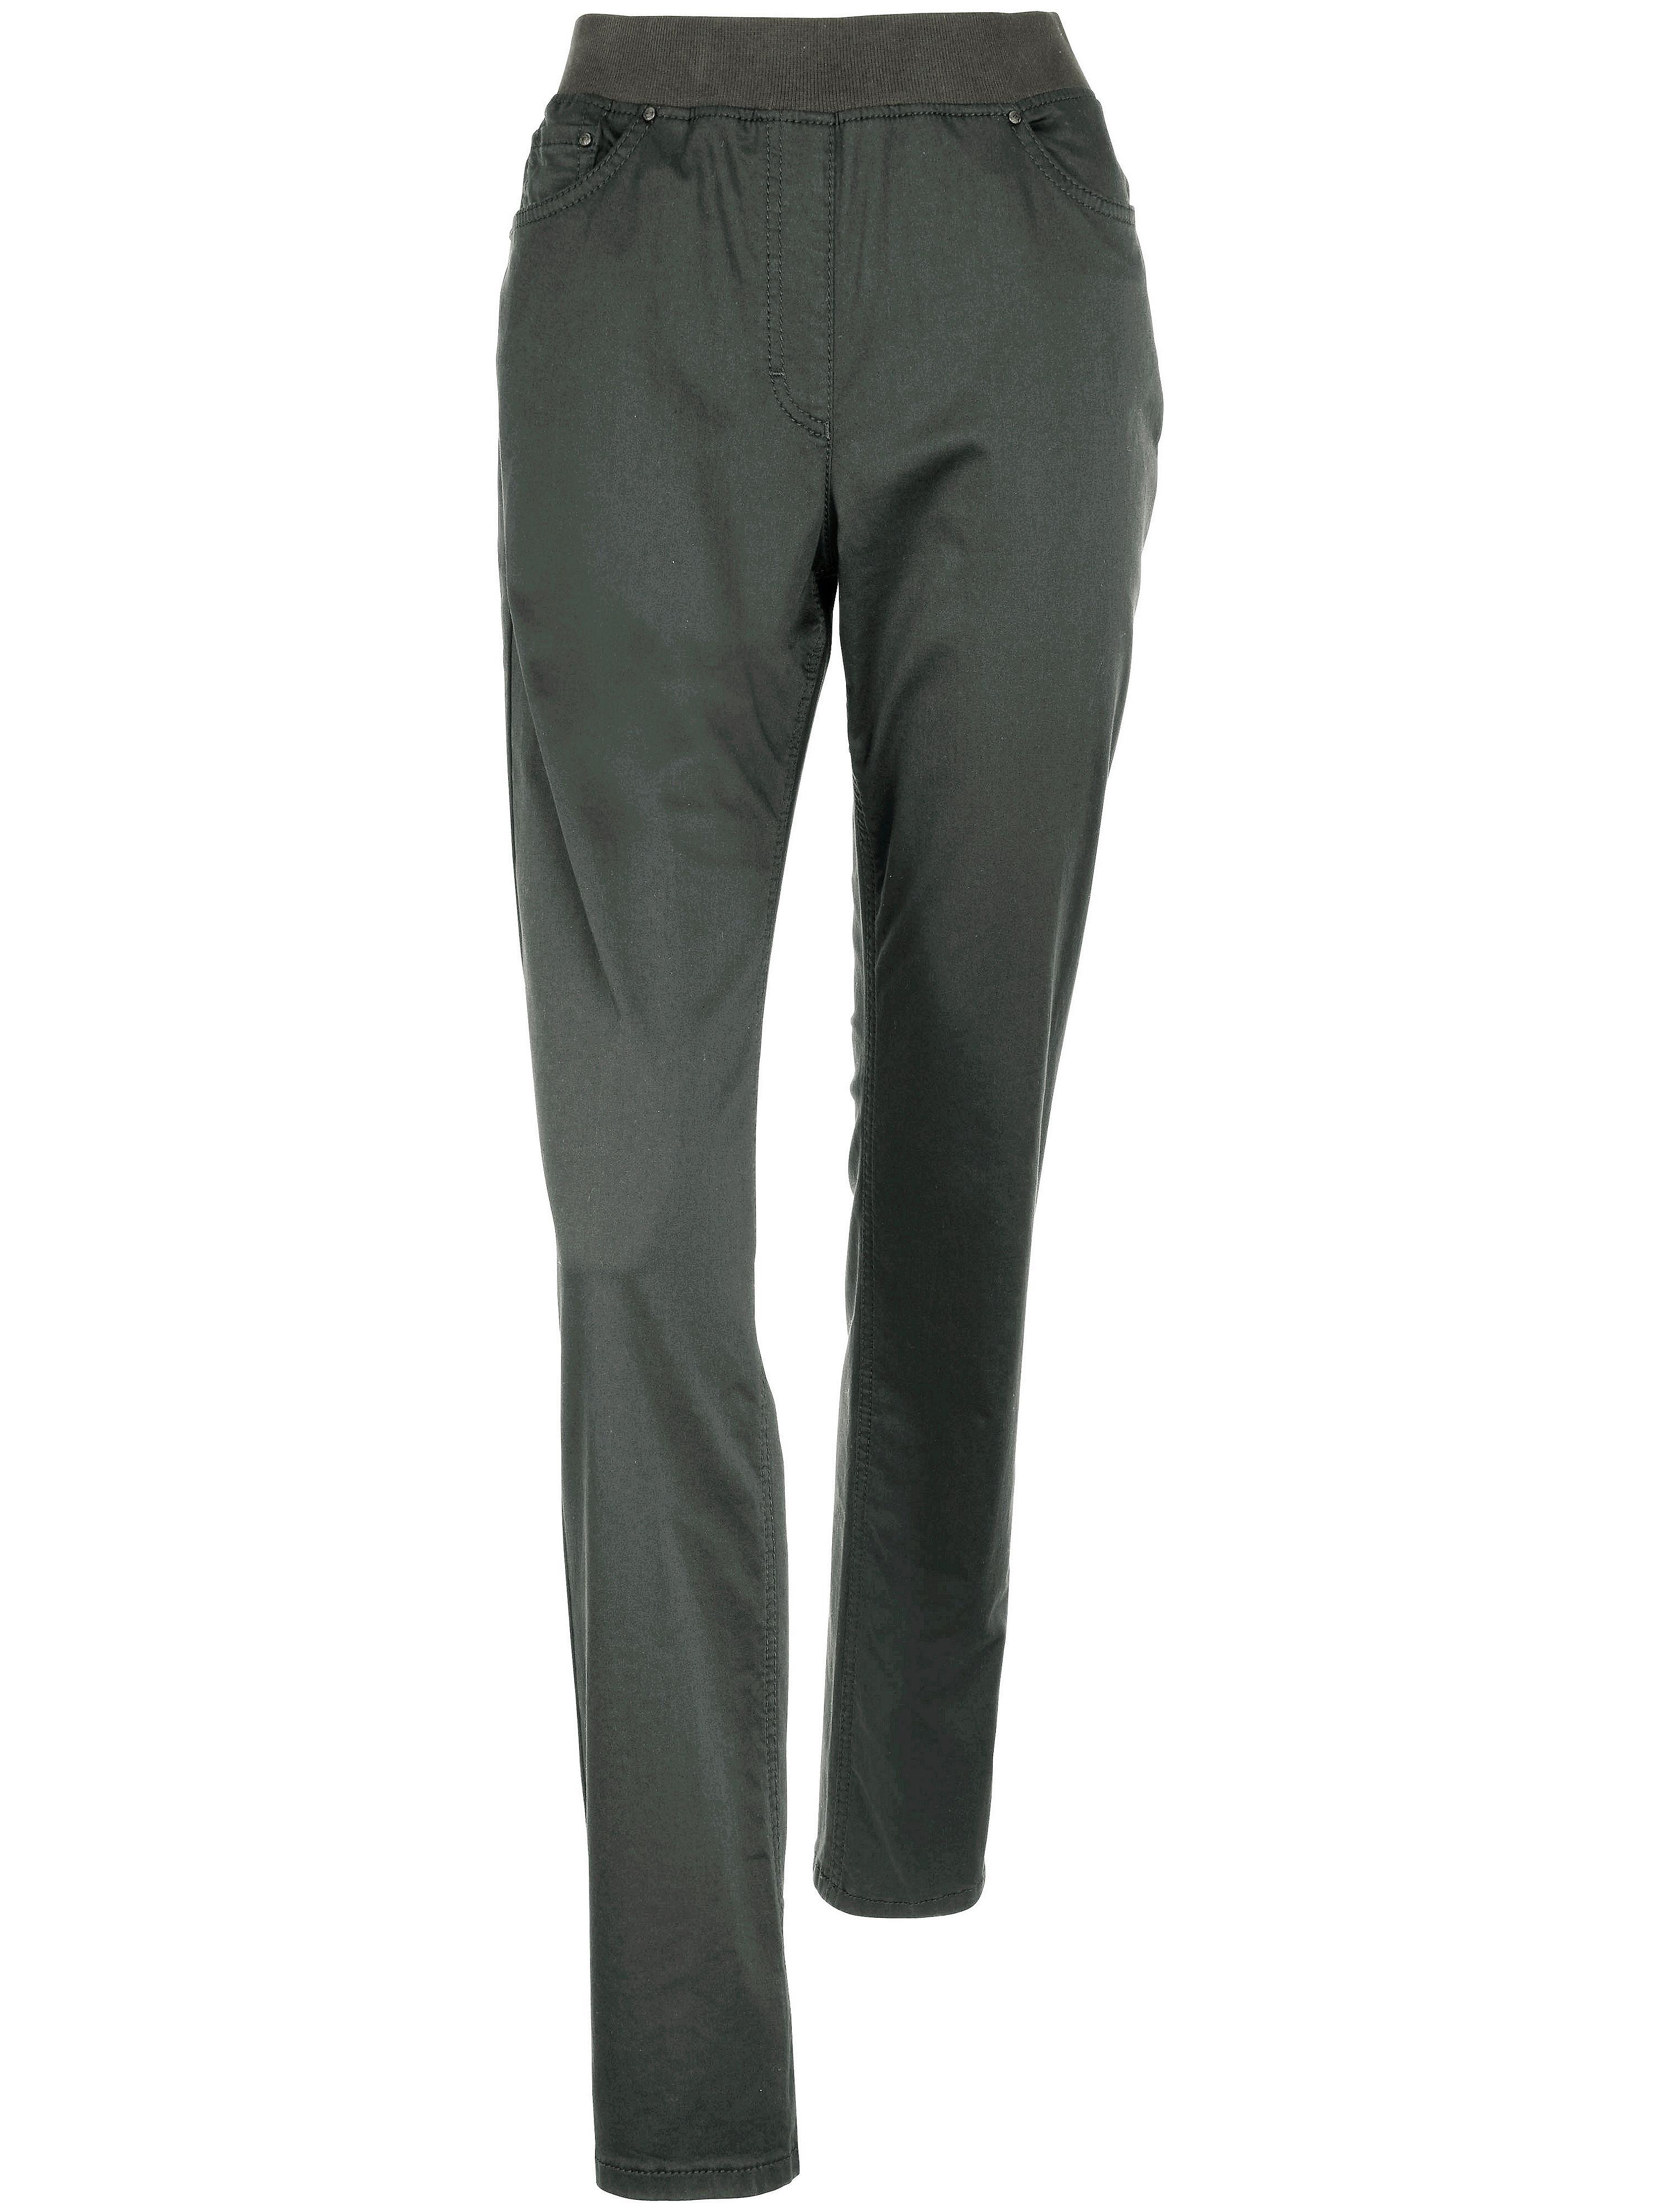 Comfort Plus-broek, model Carina Van Raphaela by Brax groen